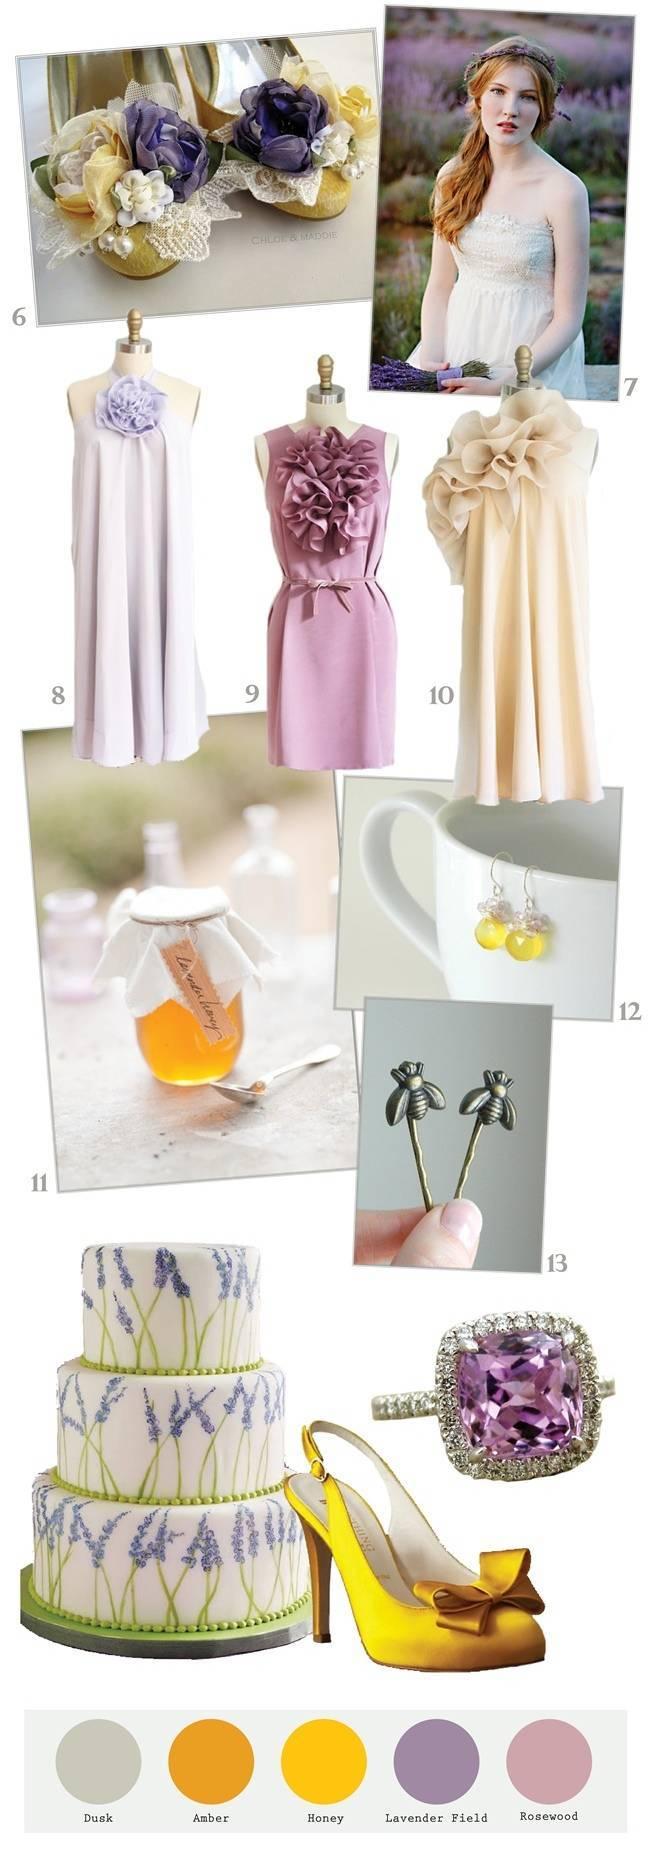 Lavender + Honey Wedding Inspiration